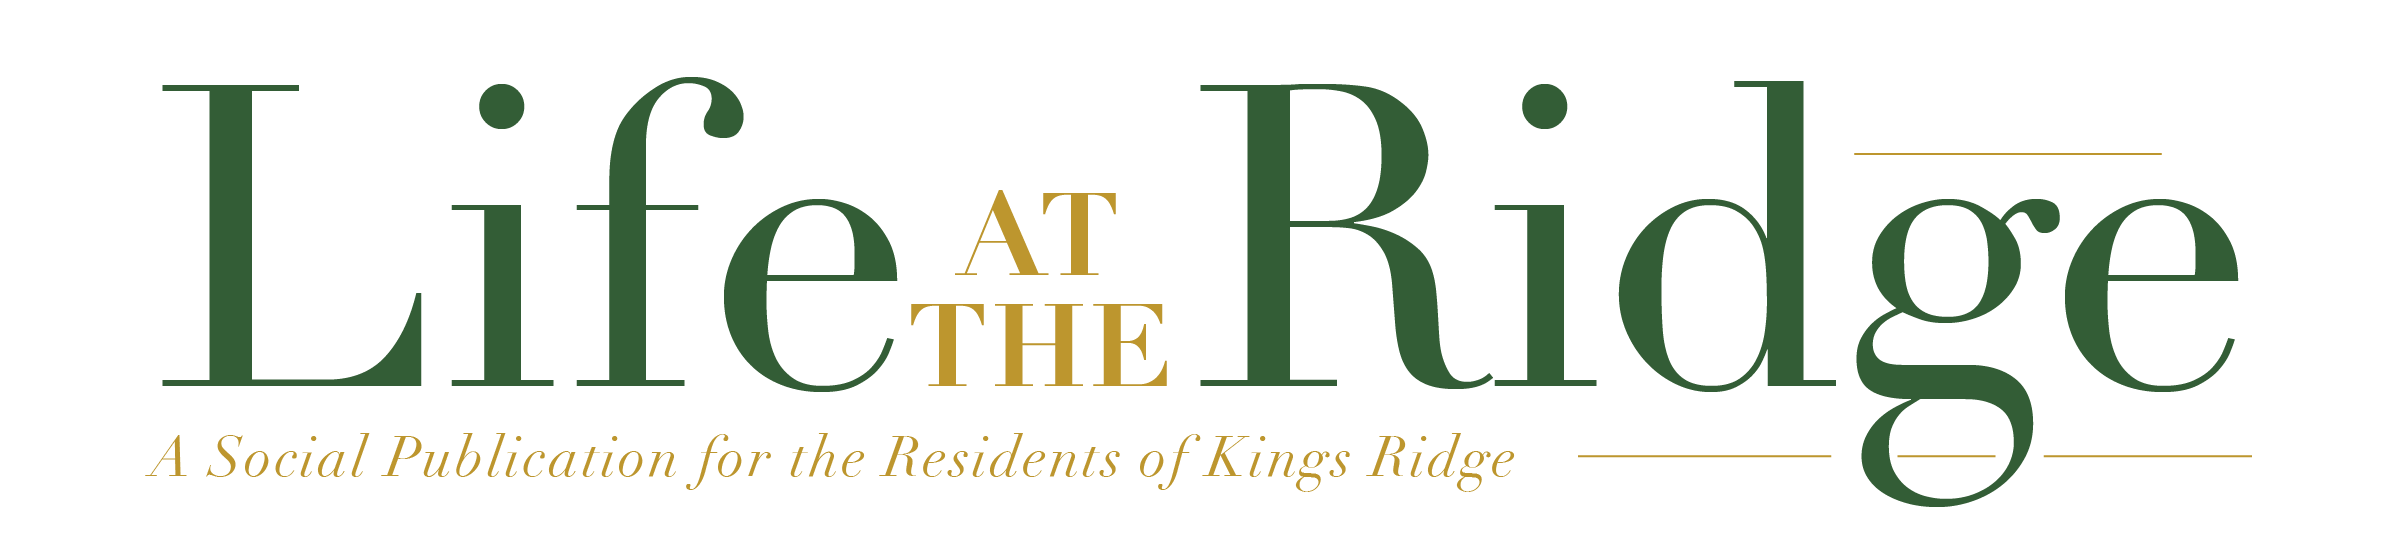 Kings Ridge Life at the Ridge